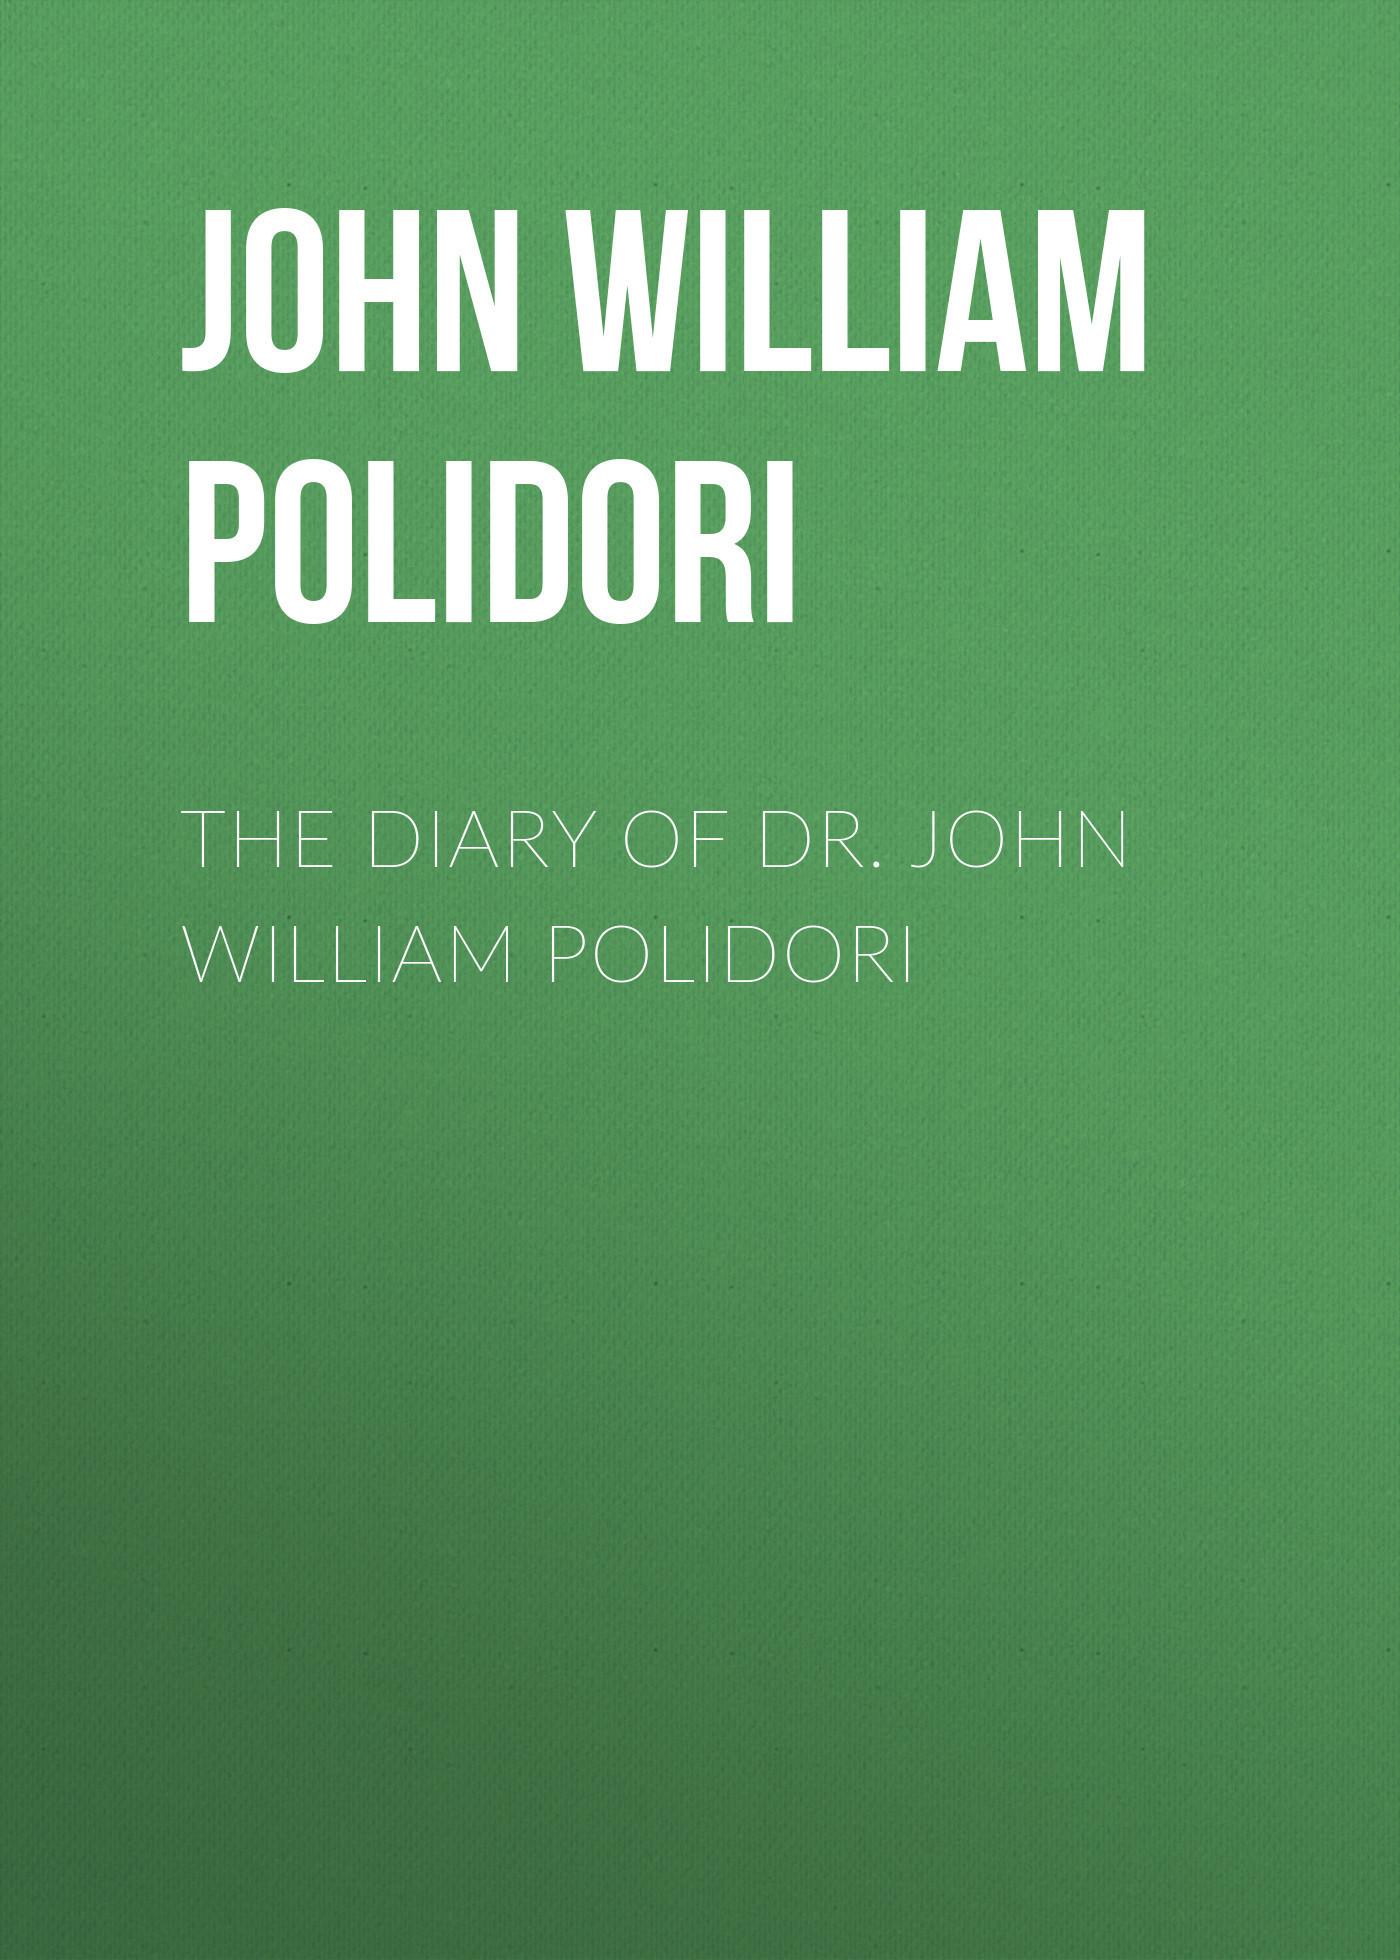 John William Polidori The Diary of Dr. John William Polidori william gell pompeiana